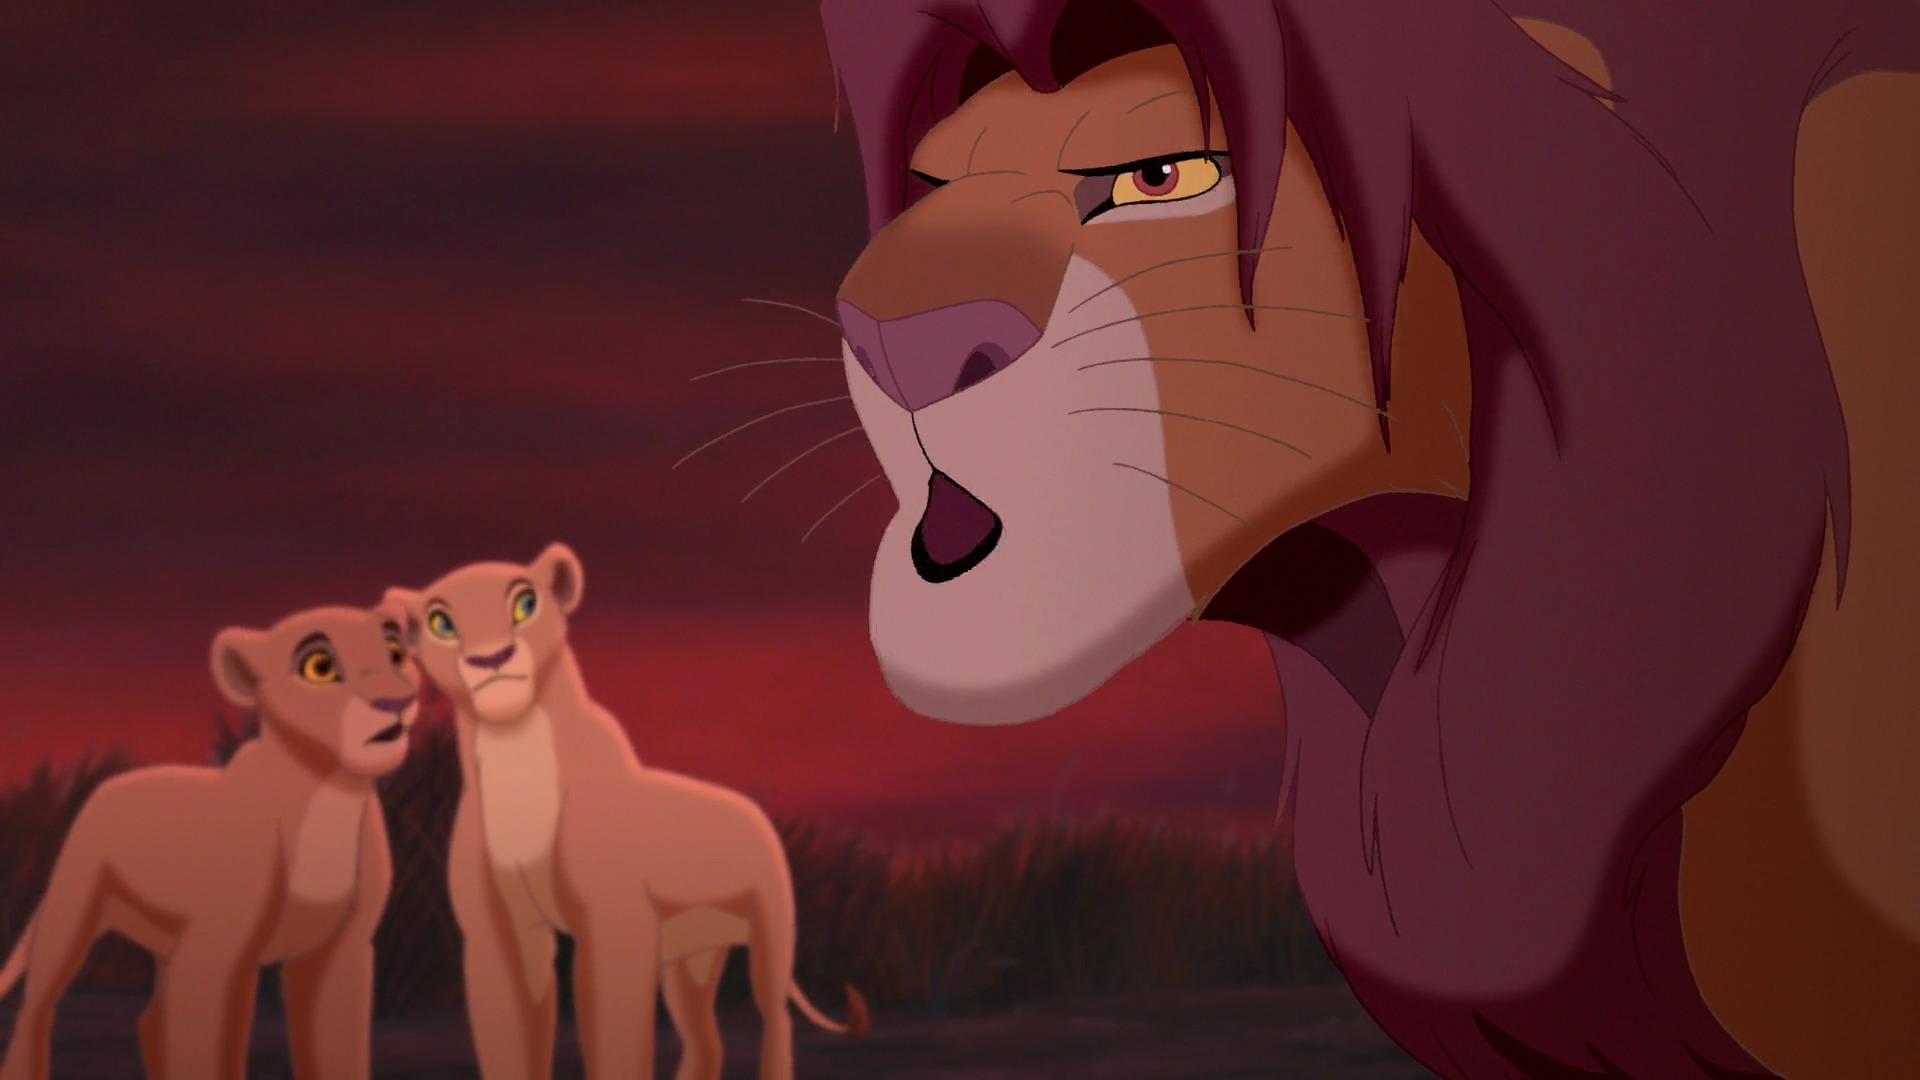 Best Nala Screencap from Simba's Pride